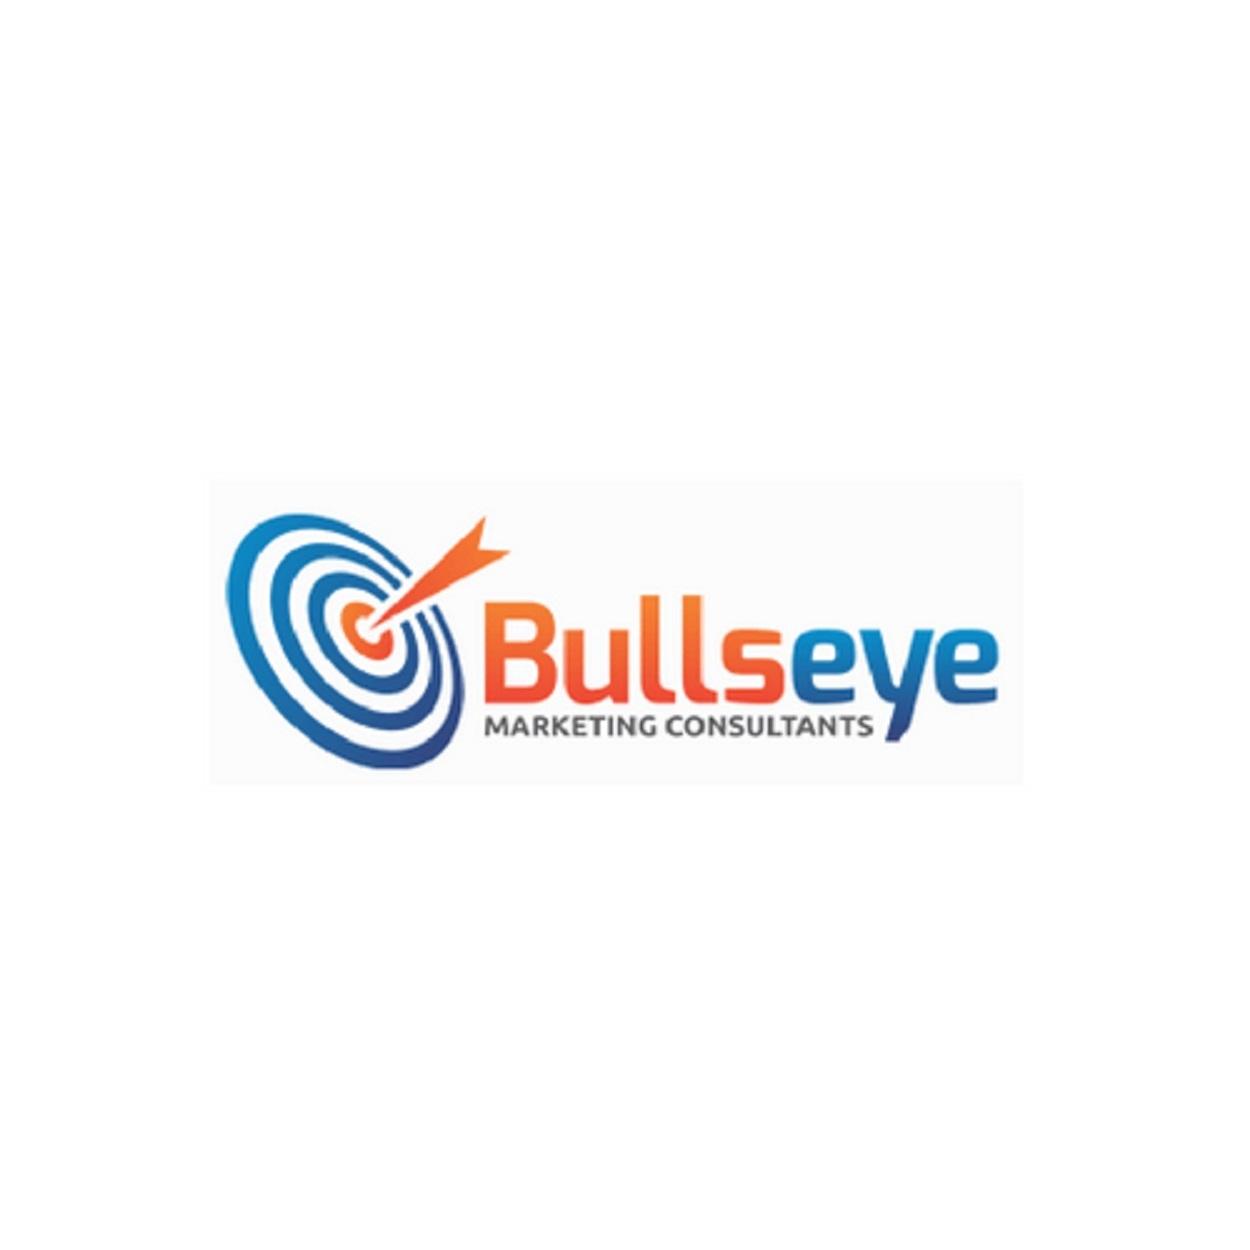 Bullseye Marketing Consultants primary image